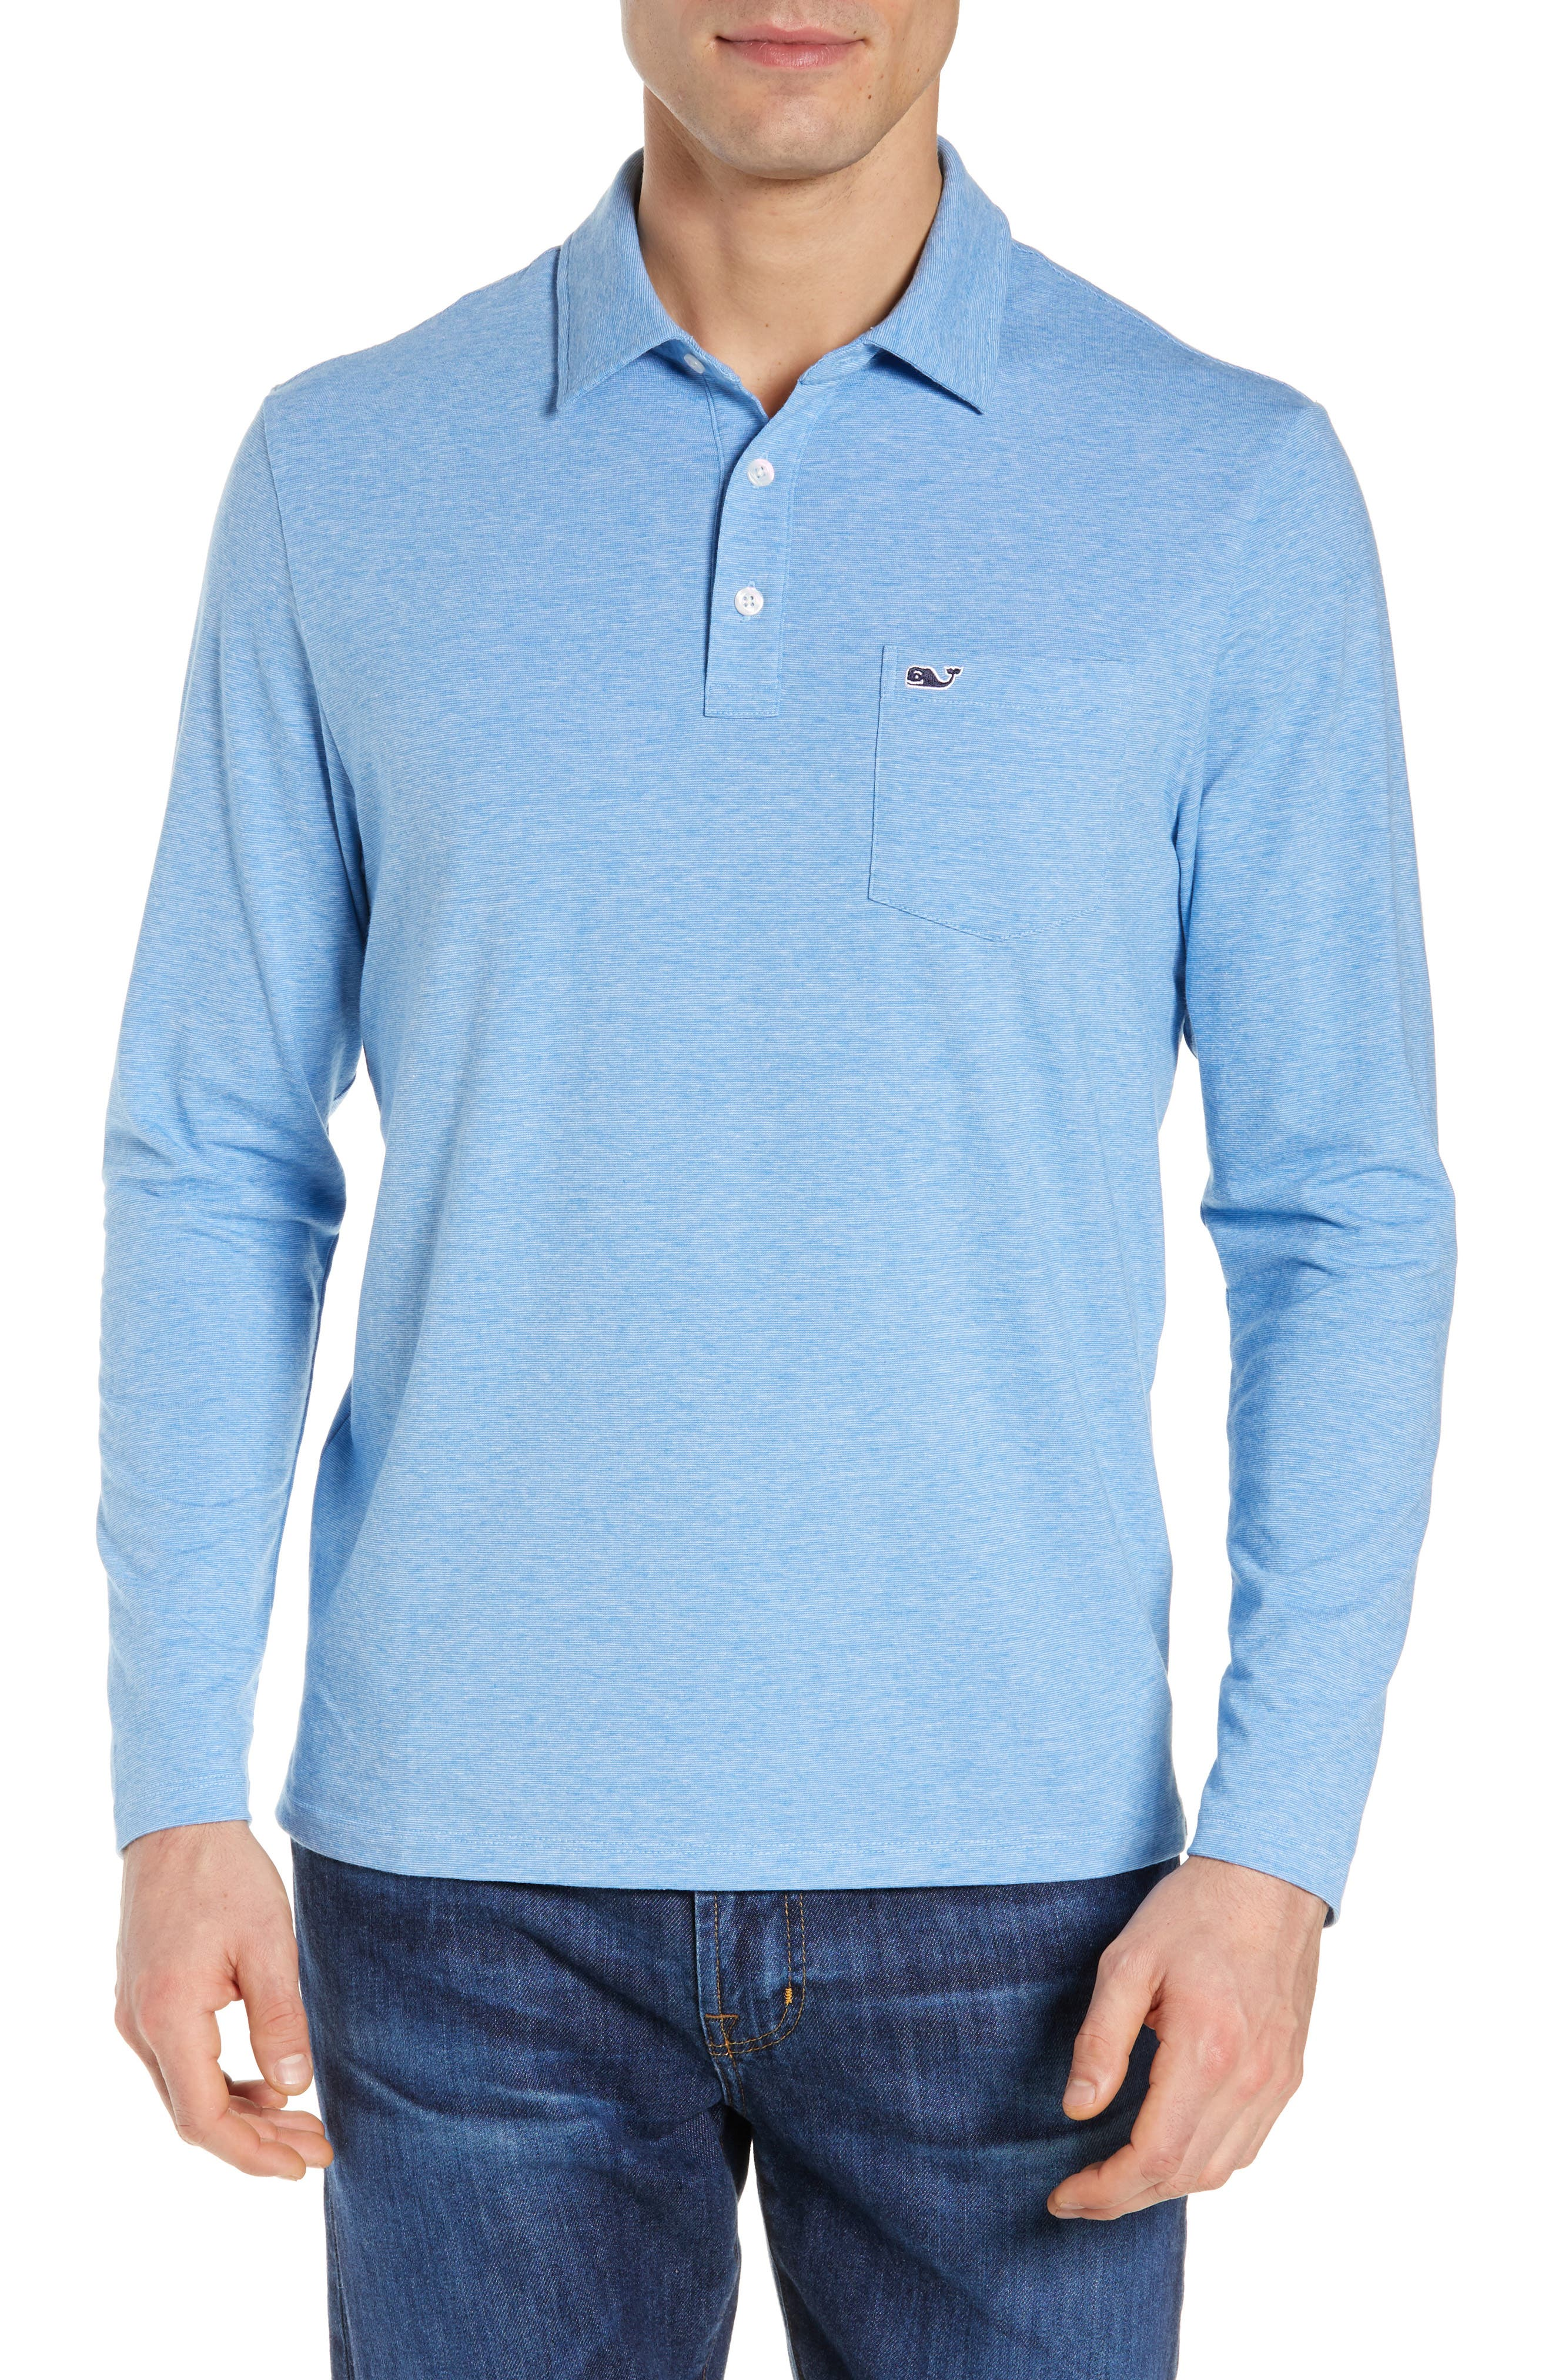 VINEYARD VINES Edgartown Long-Sleeve Polo Shirt in Hull Blue